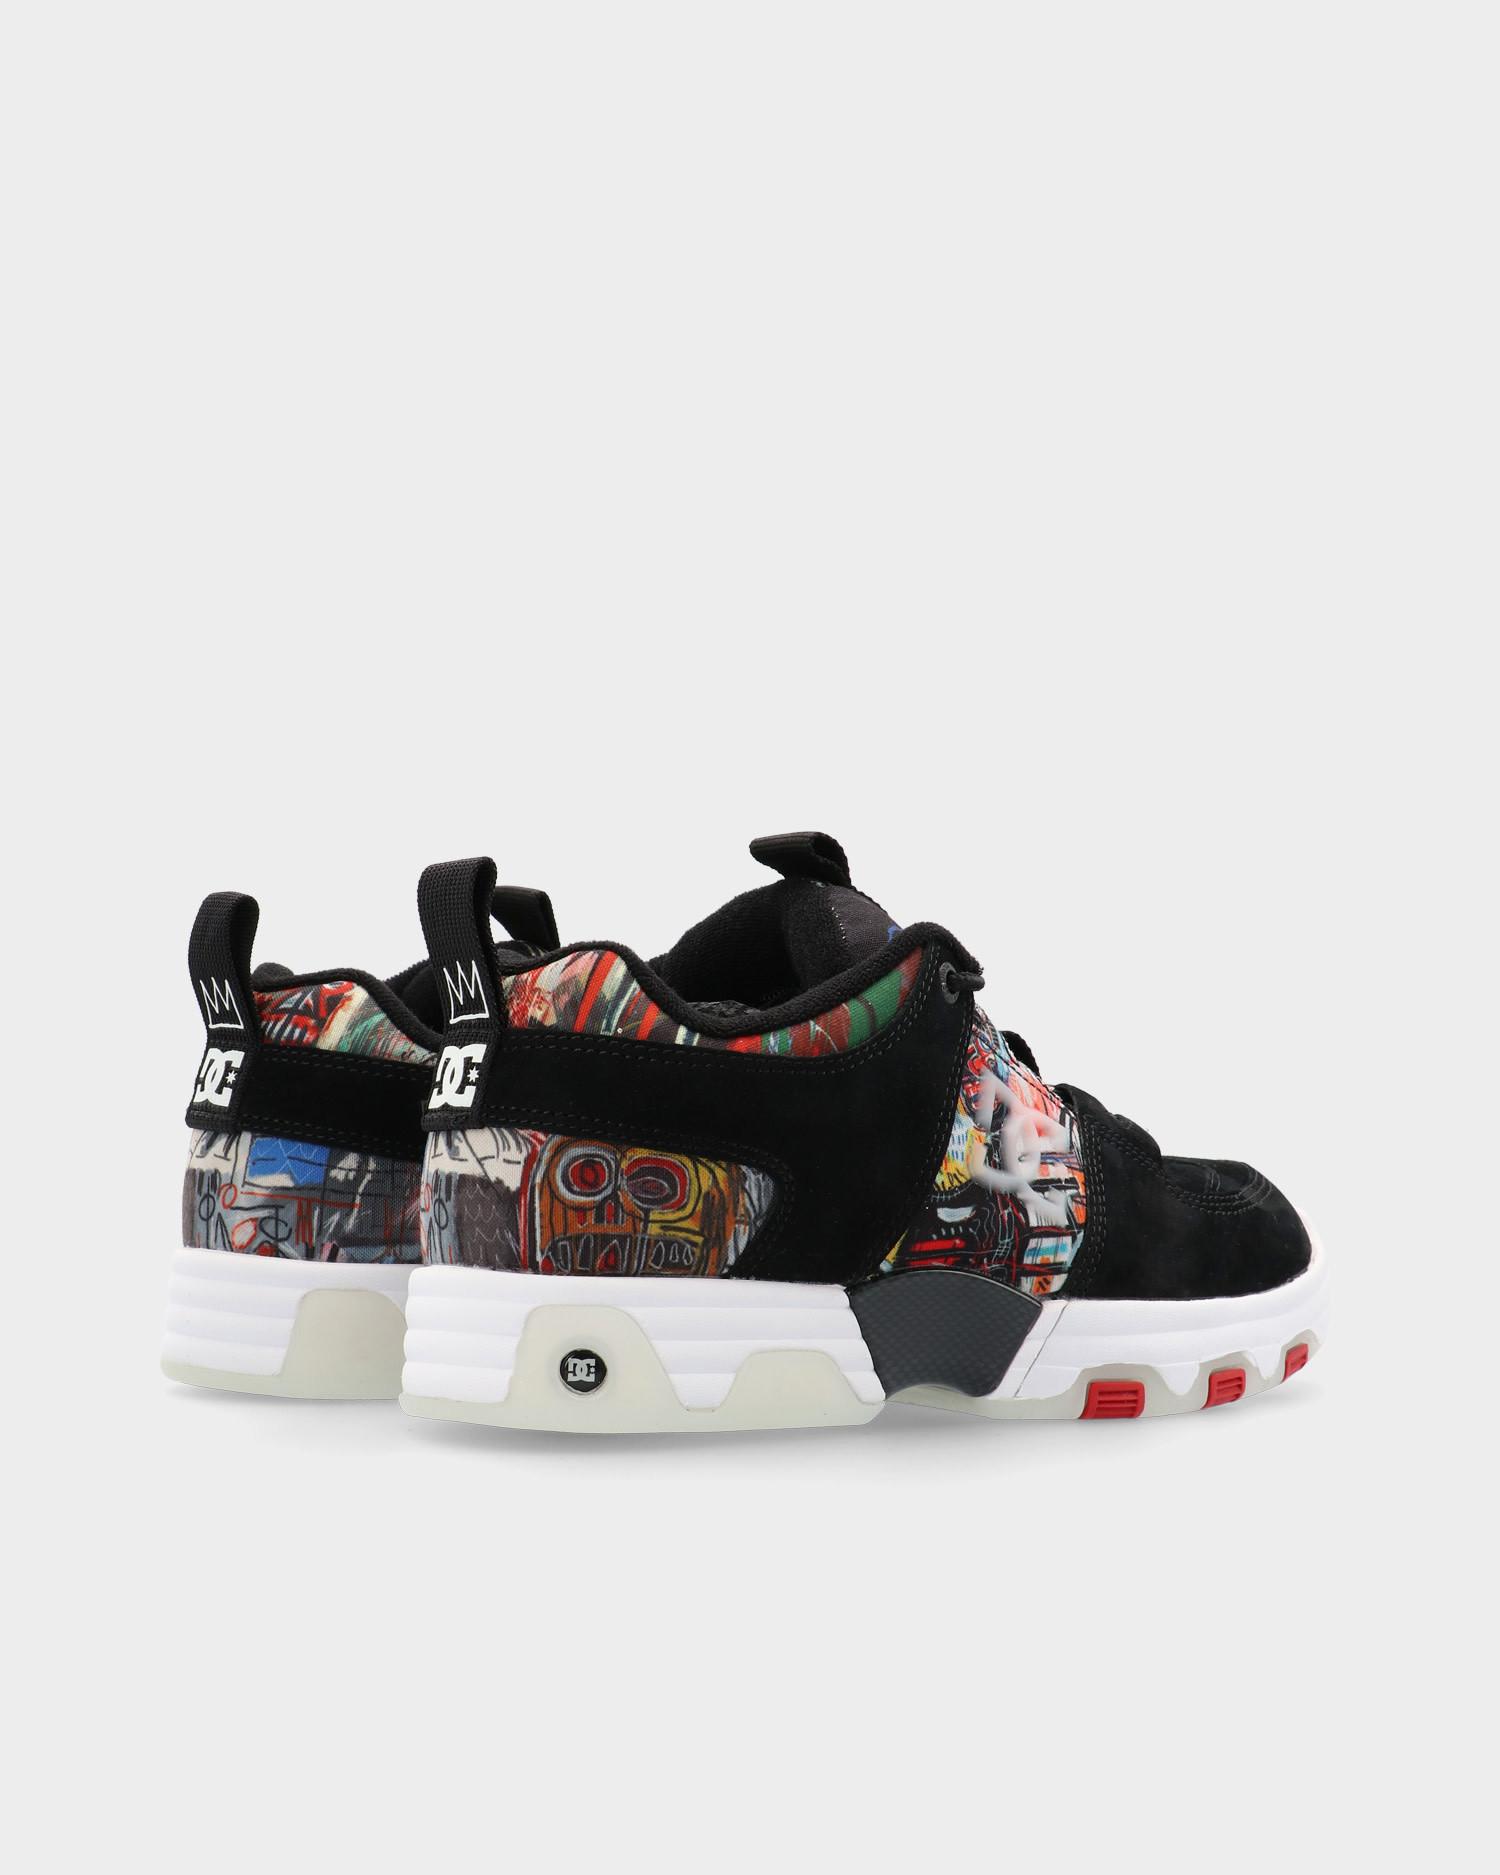 DC Basquiat Hybrid